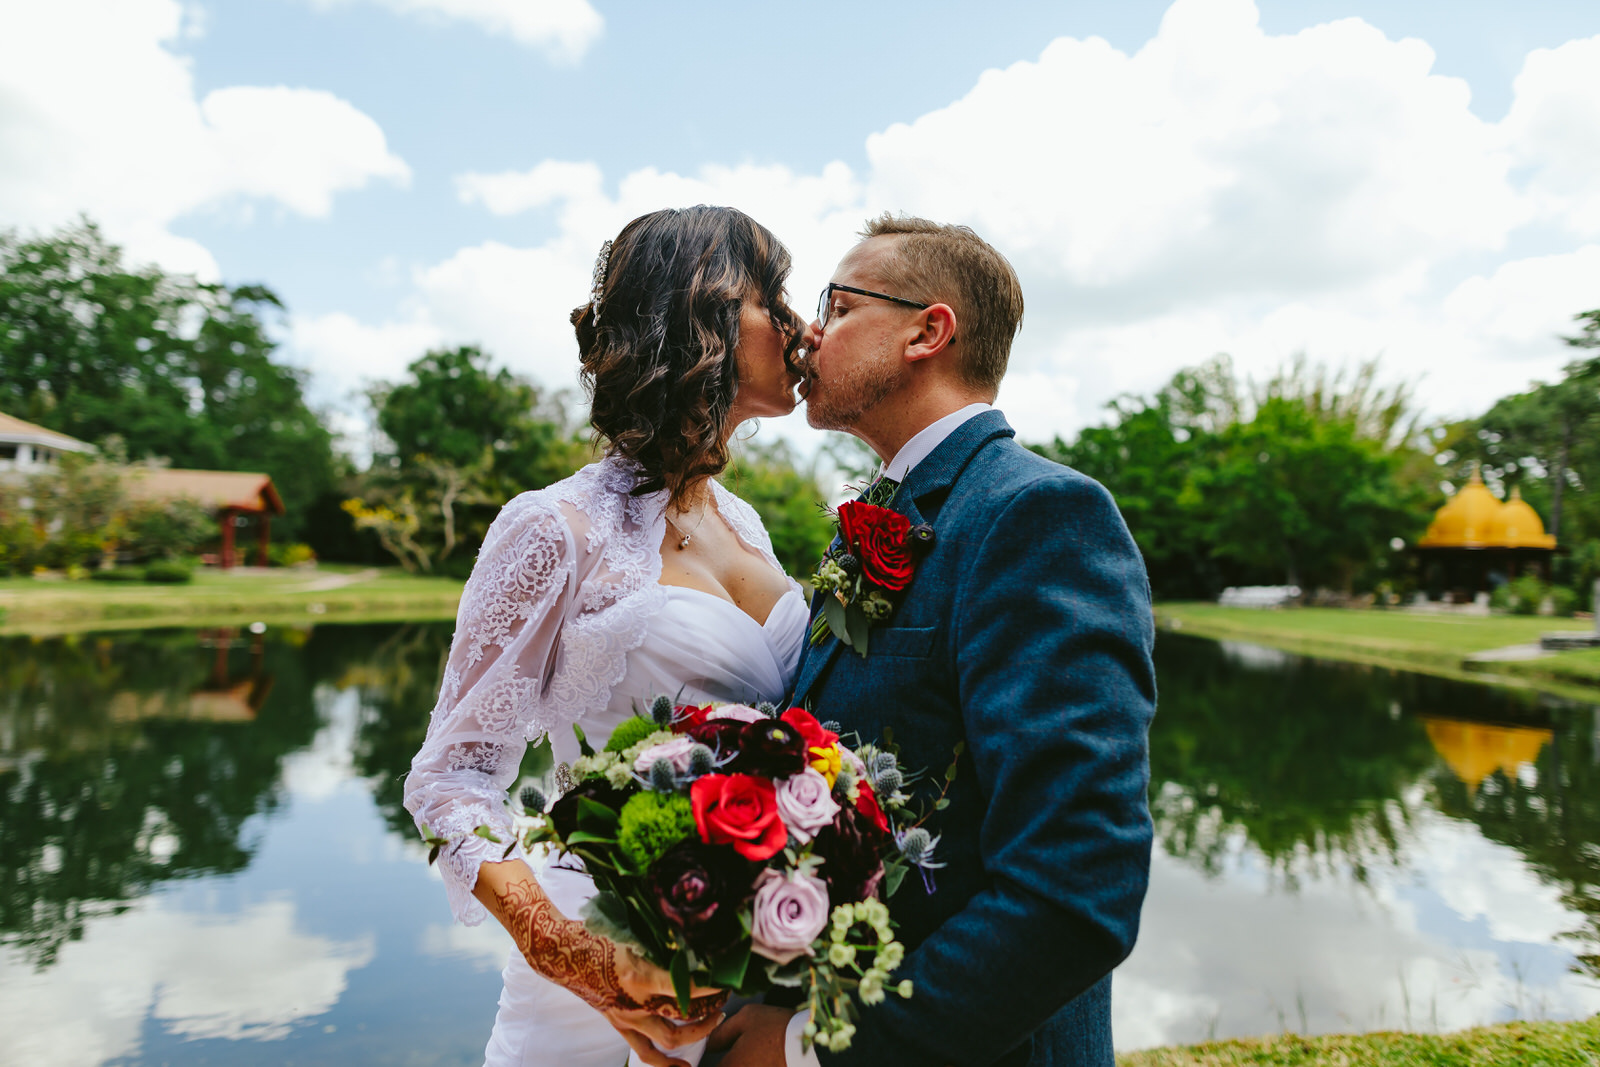 kashi-wedding-portraits-bride-and-groom-tiny-house-photo-weddings-kissing.jpg